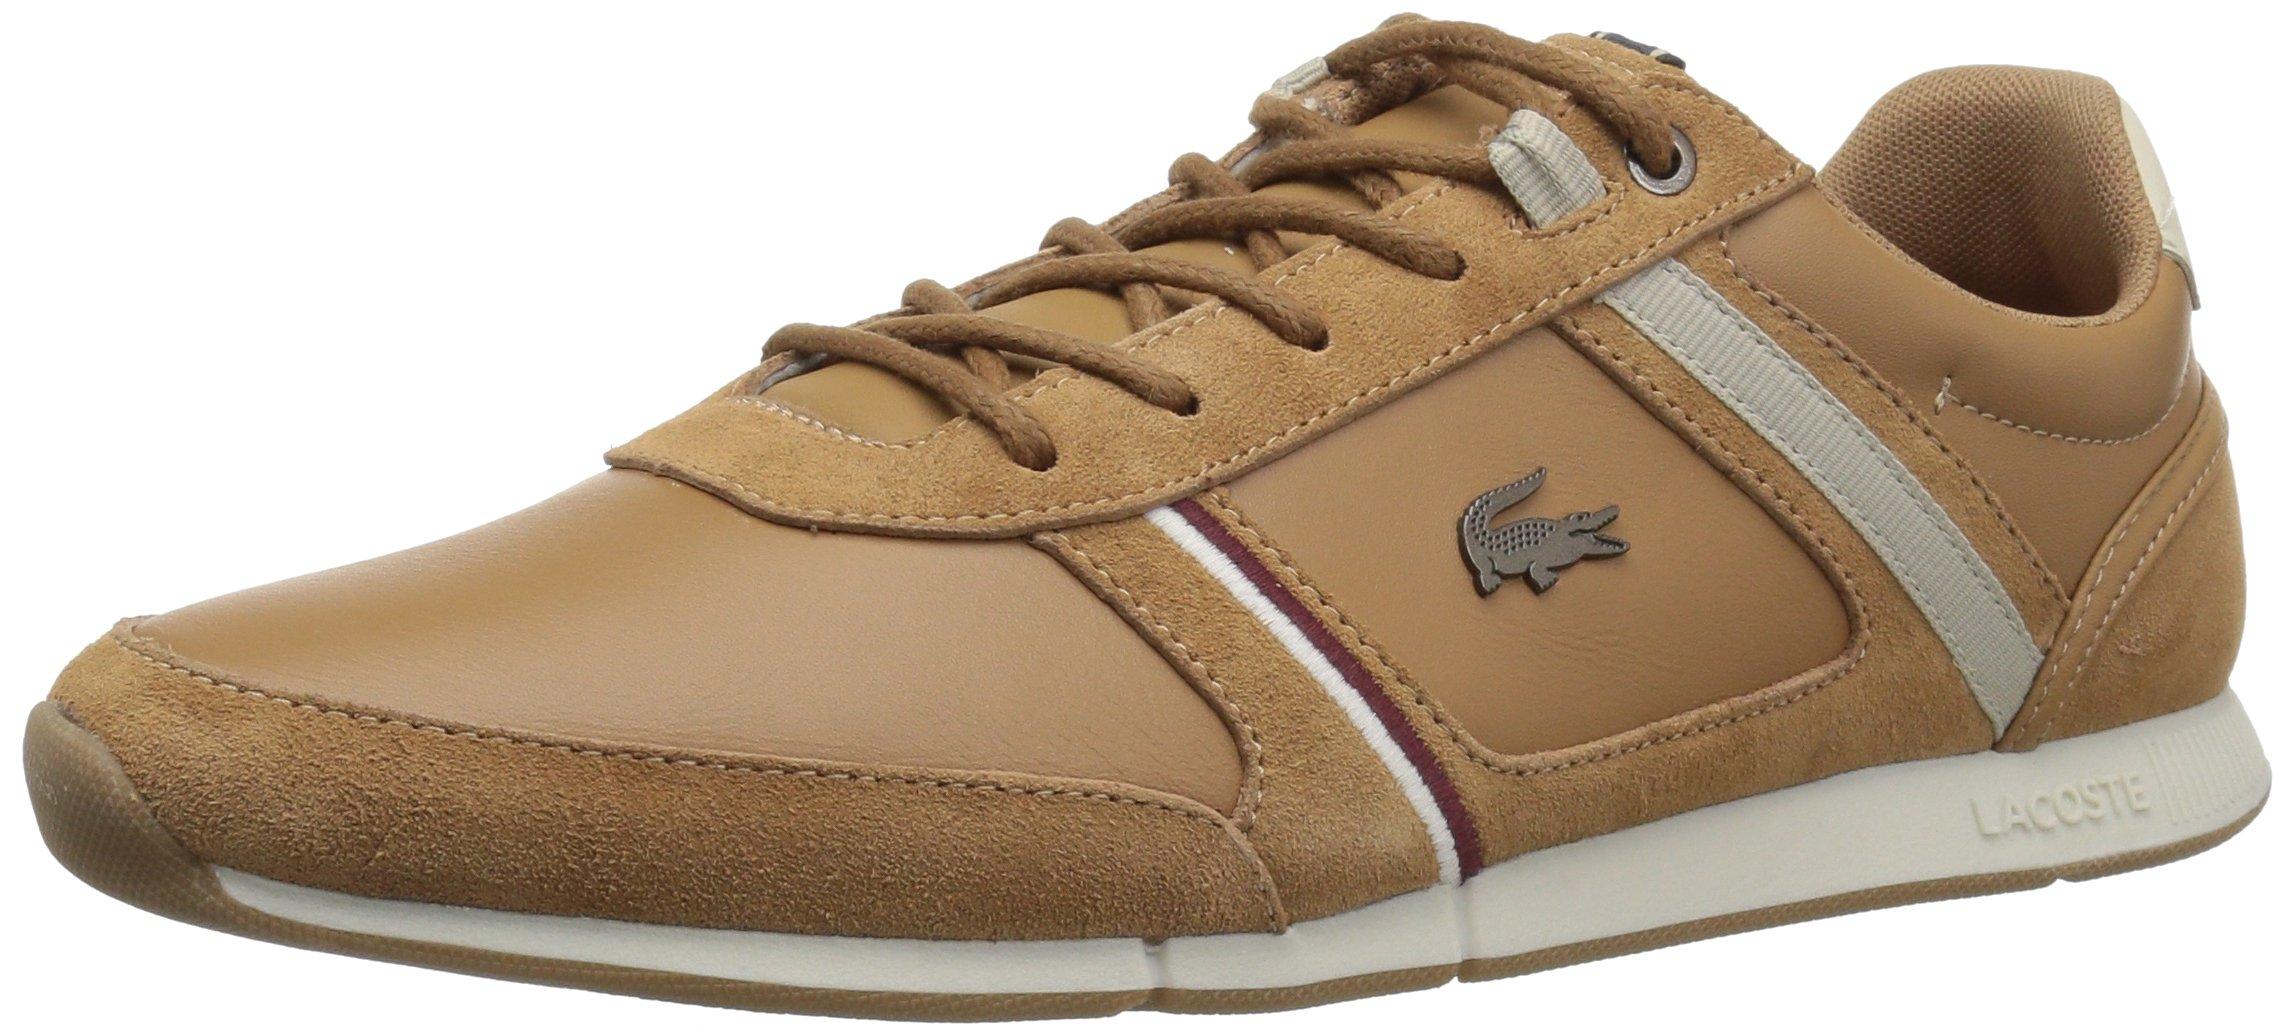 Lacoste Men's Menerva 118 1 Sneaker, Light Brown/Natural, 10.5 M US